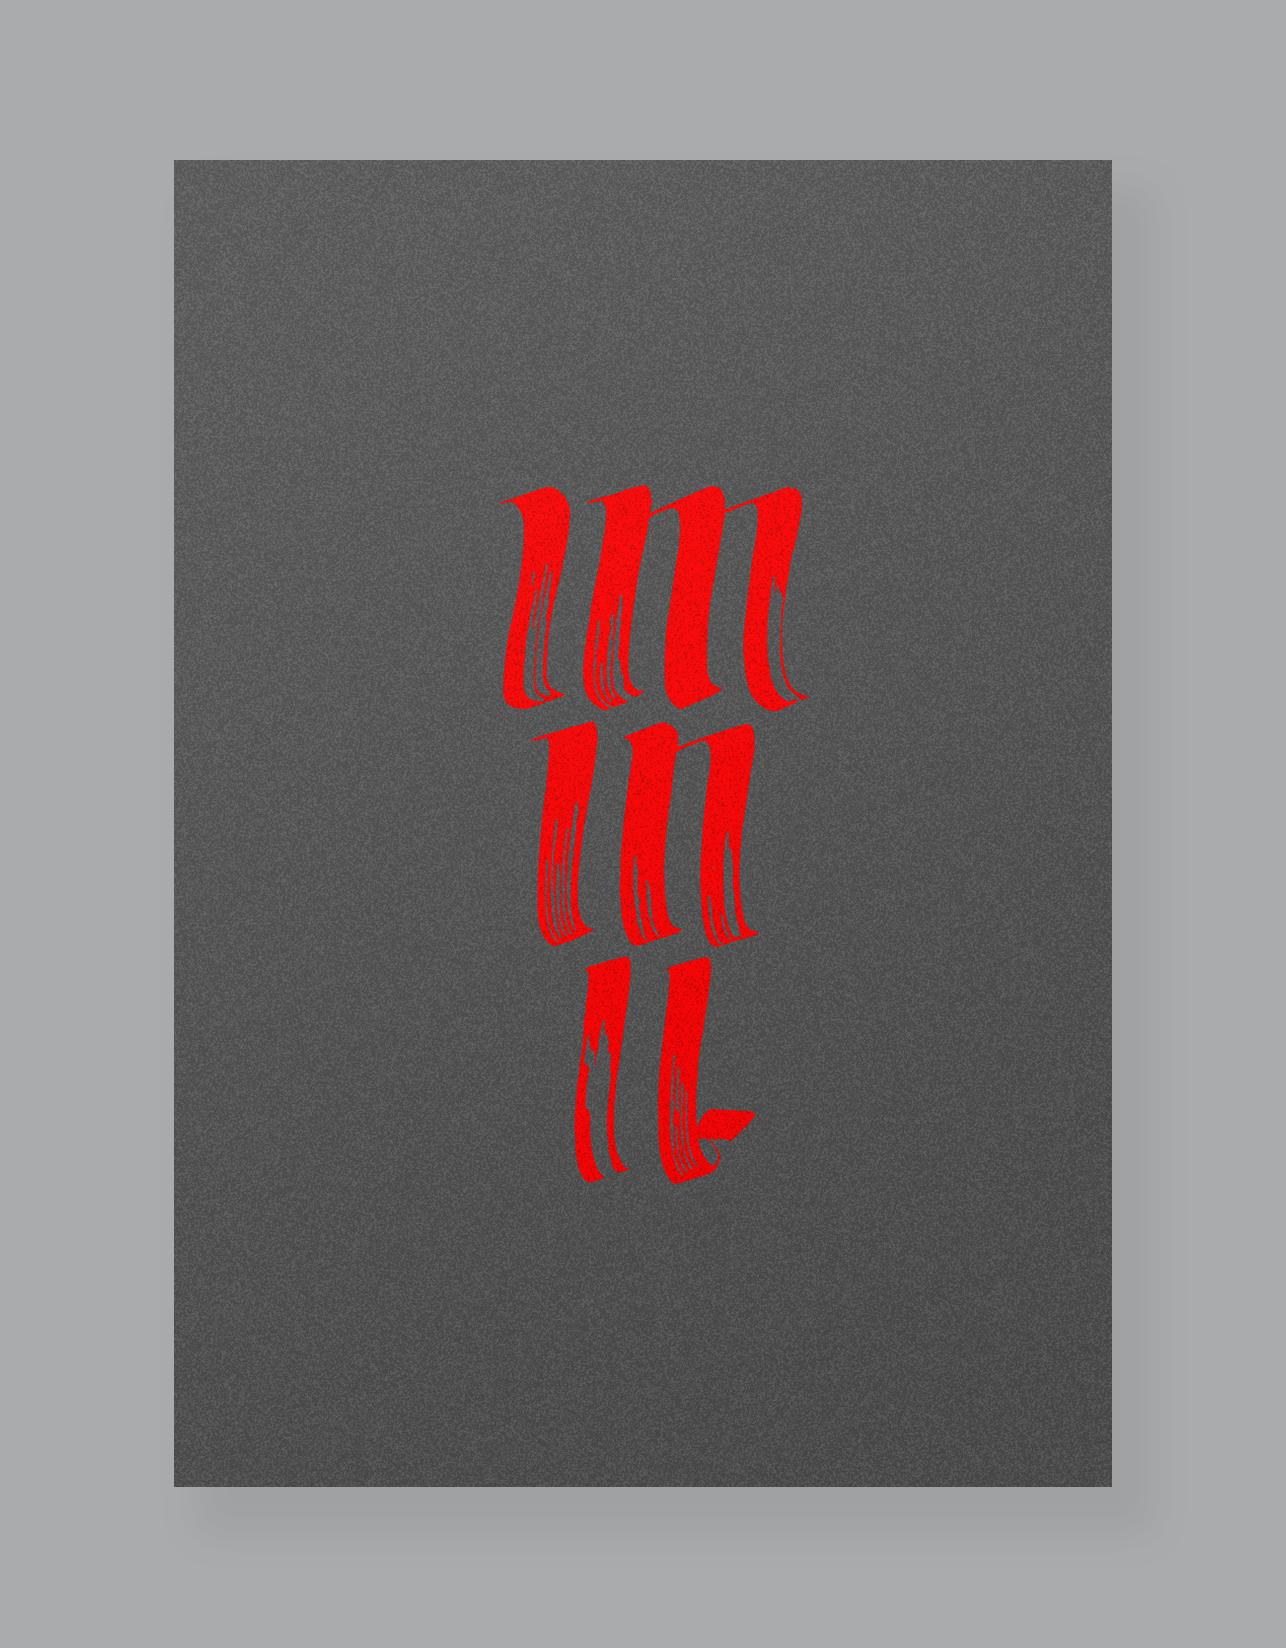 Arts_Poster_B.png